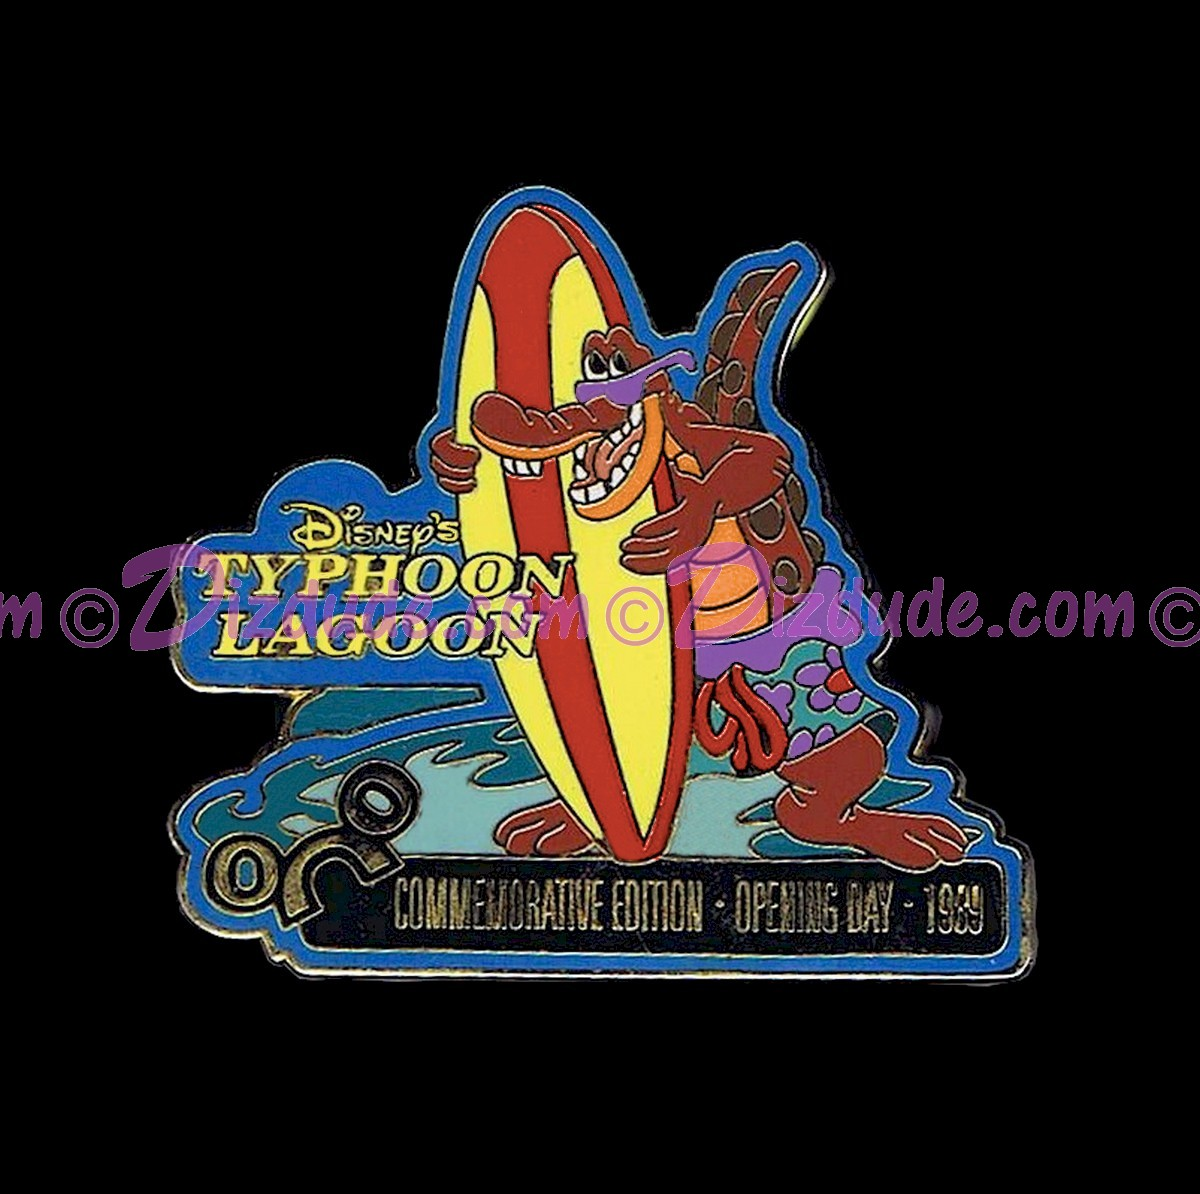 Walt Disney World June 2000 Pin of the Month - Typhoon Lagoon ©Dizdude.com